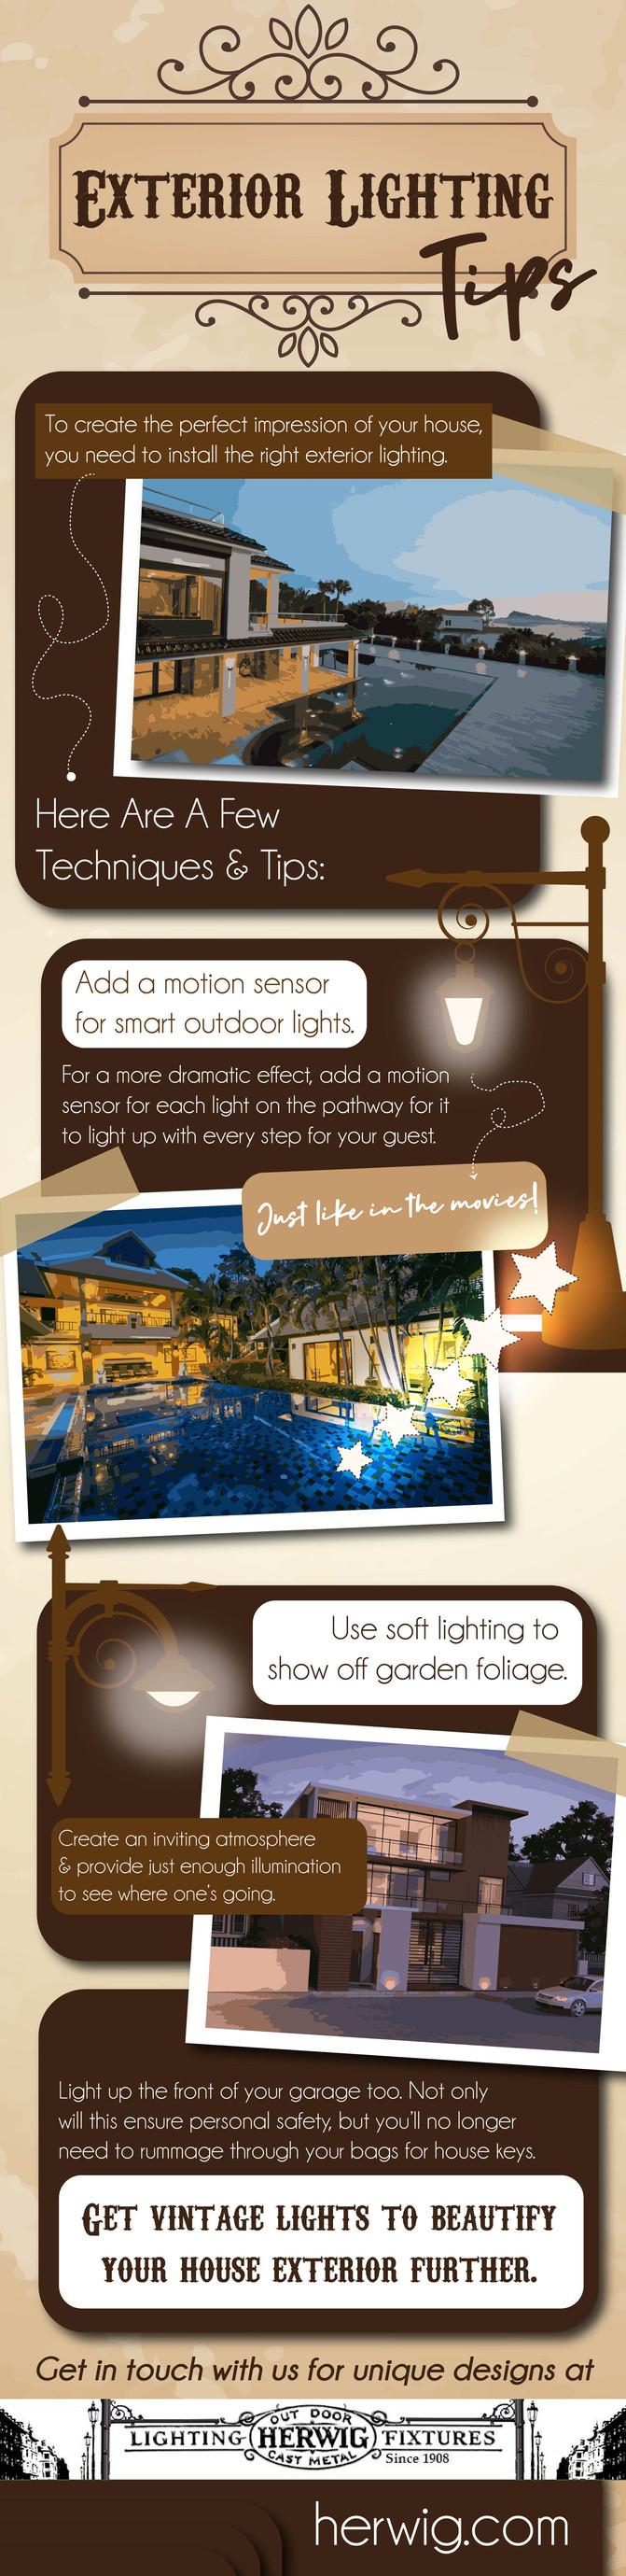 Exterior Lighting Tips